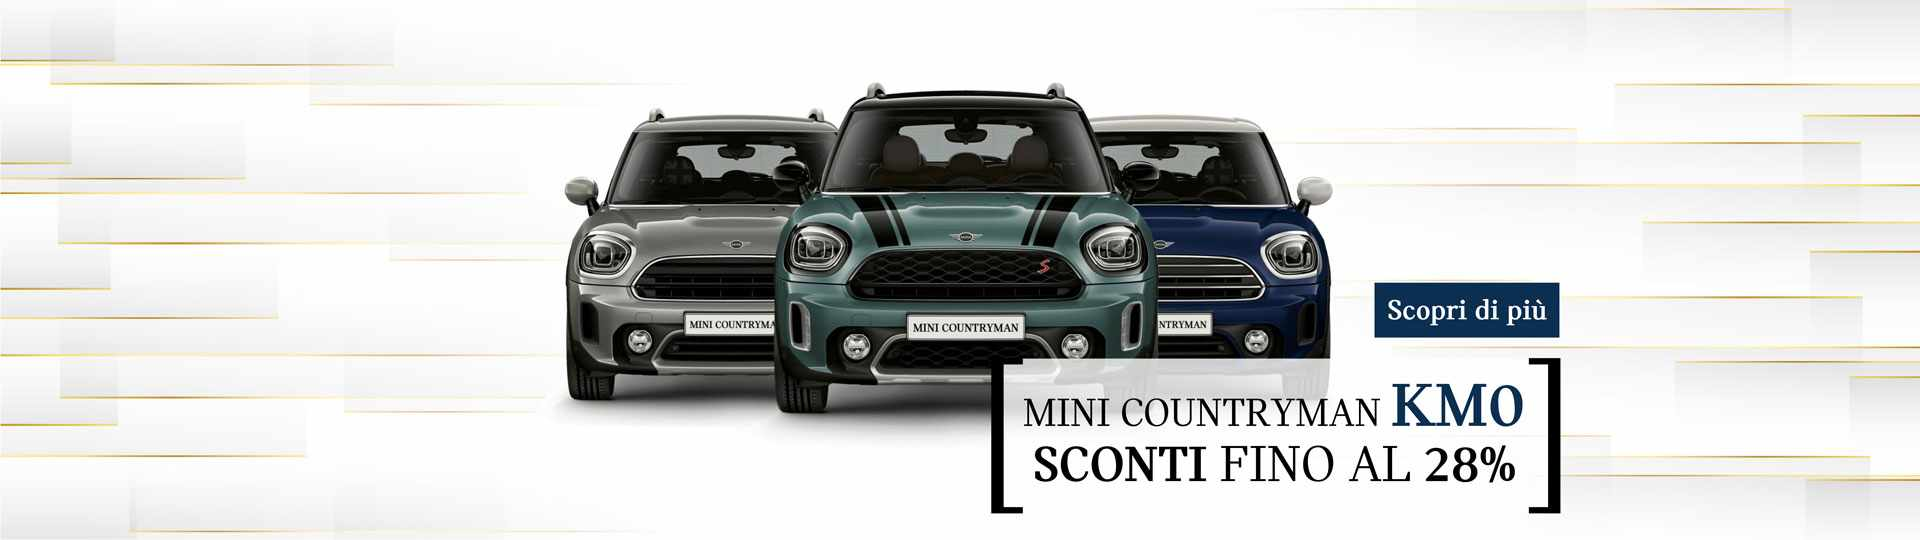 MINI-Countryman-KM0_sito-min.jpg